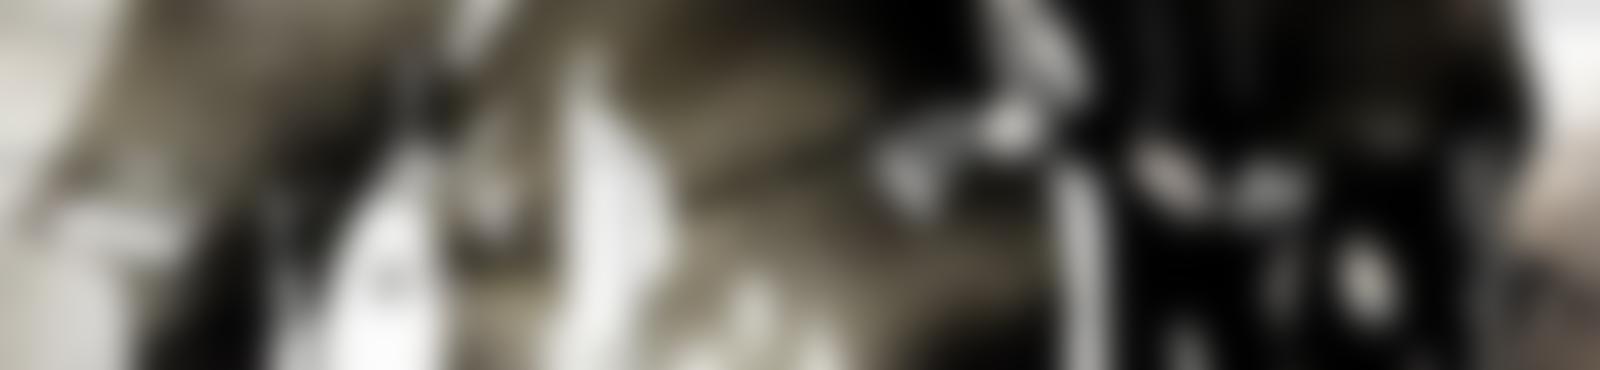 Blurred 570b5da0 f0f1 496b 92a2 d4487596d2bb